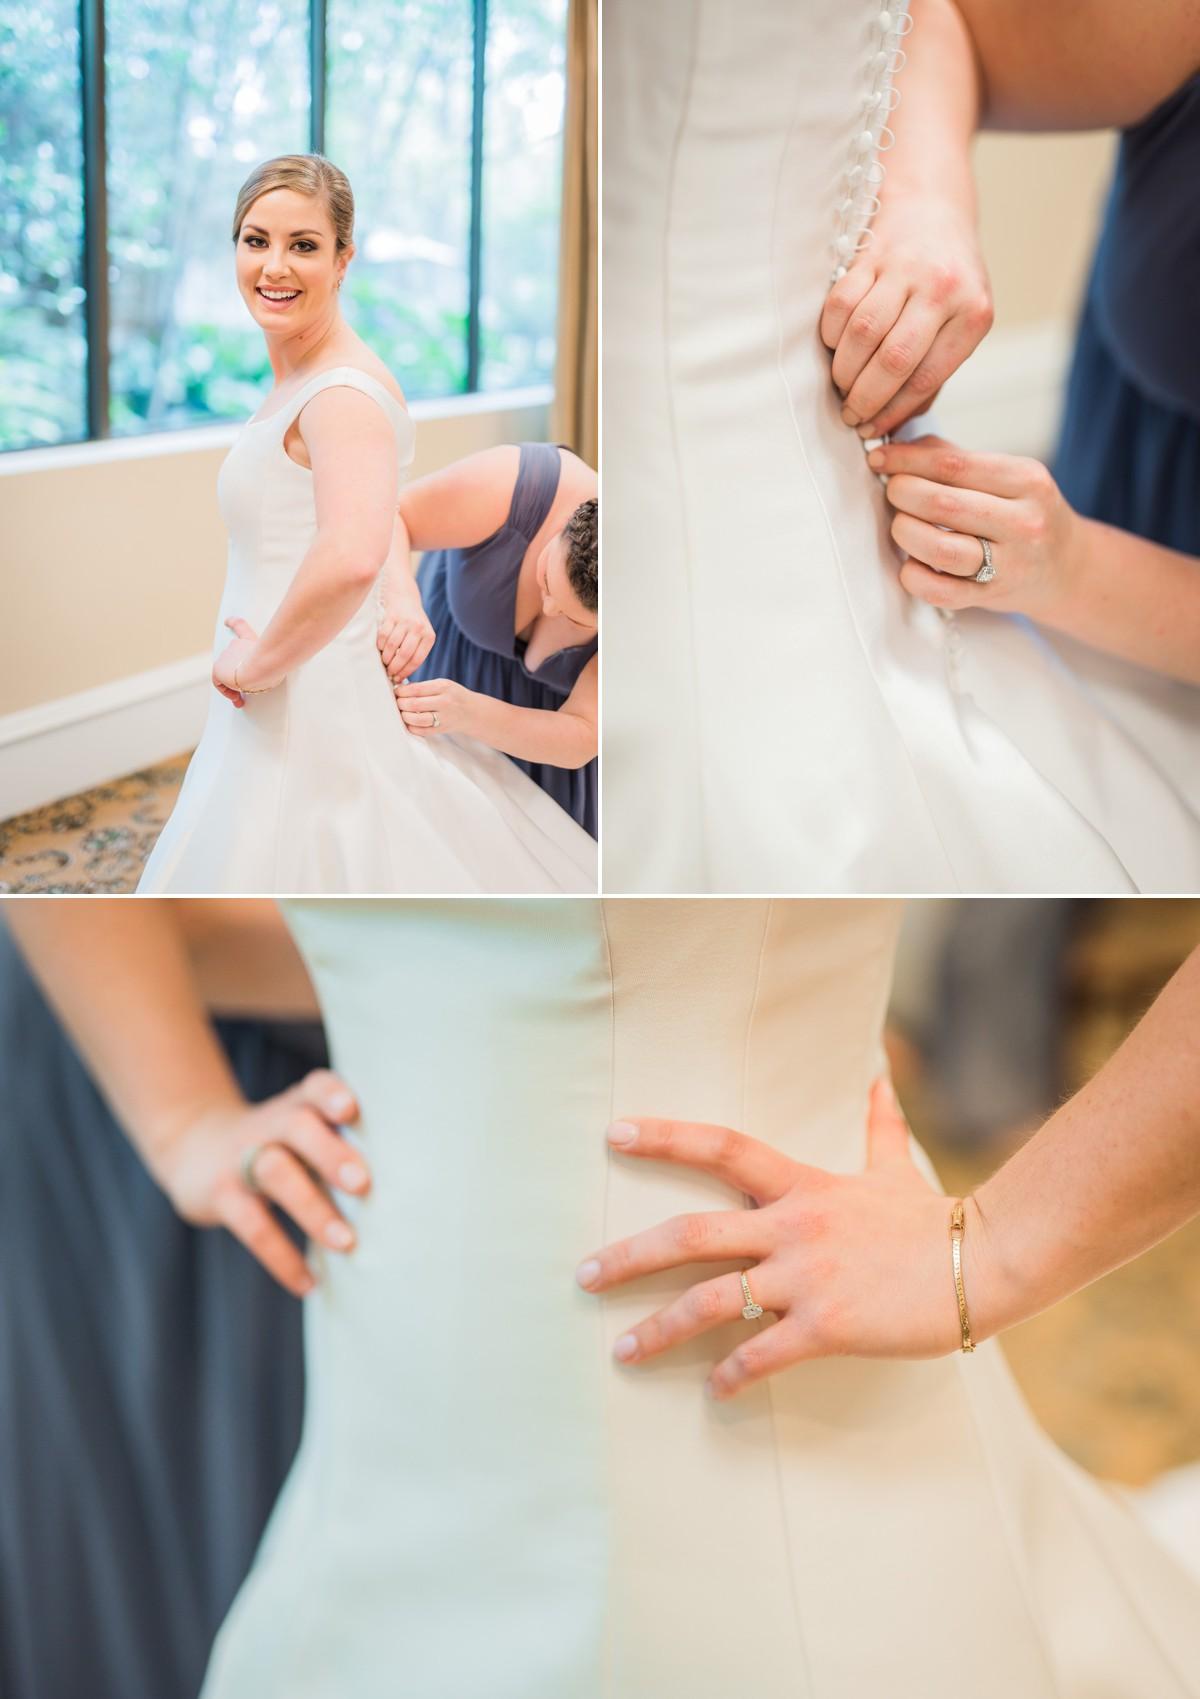 Lauren Wedding Dress Makeup photos